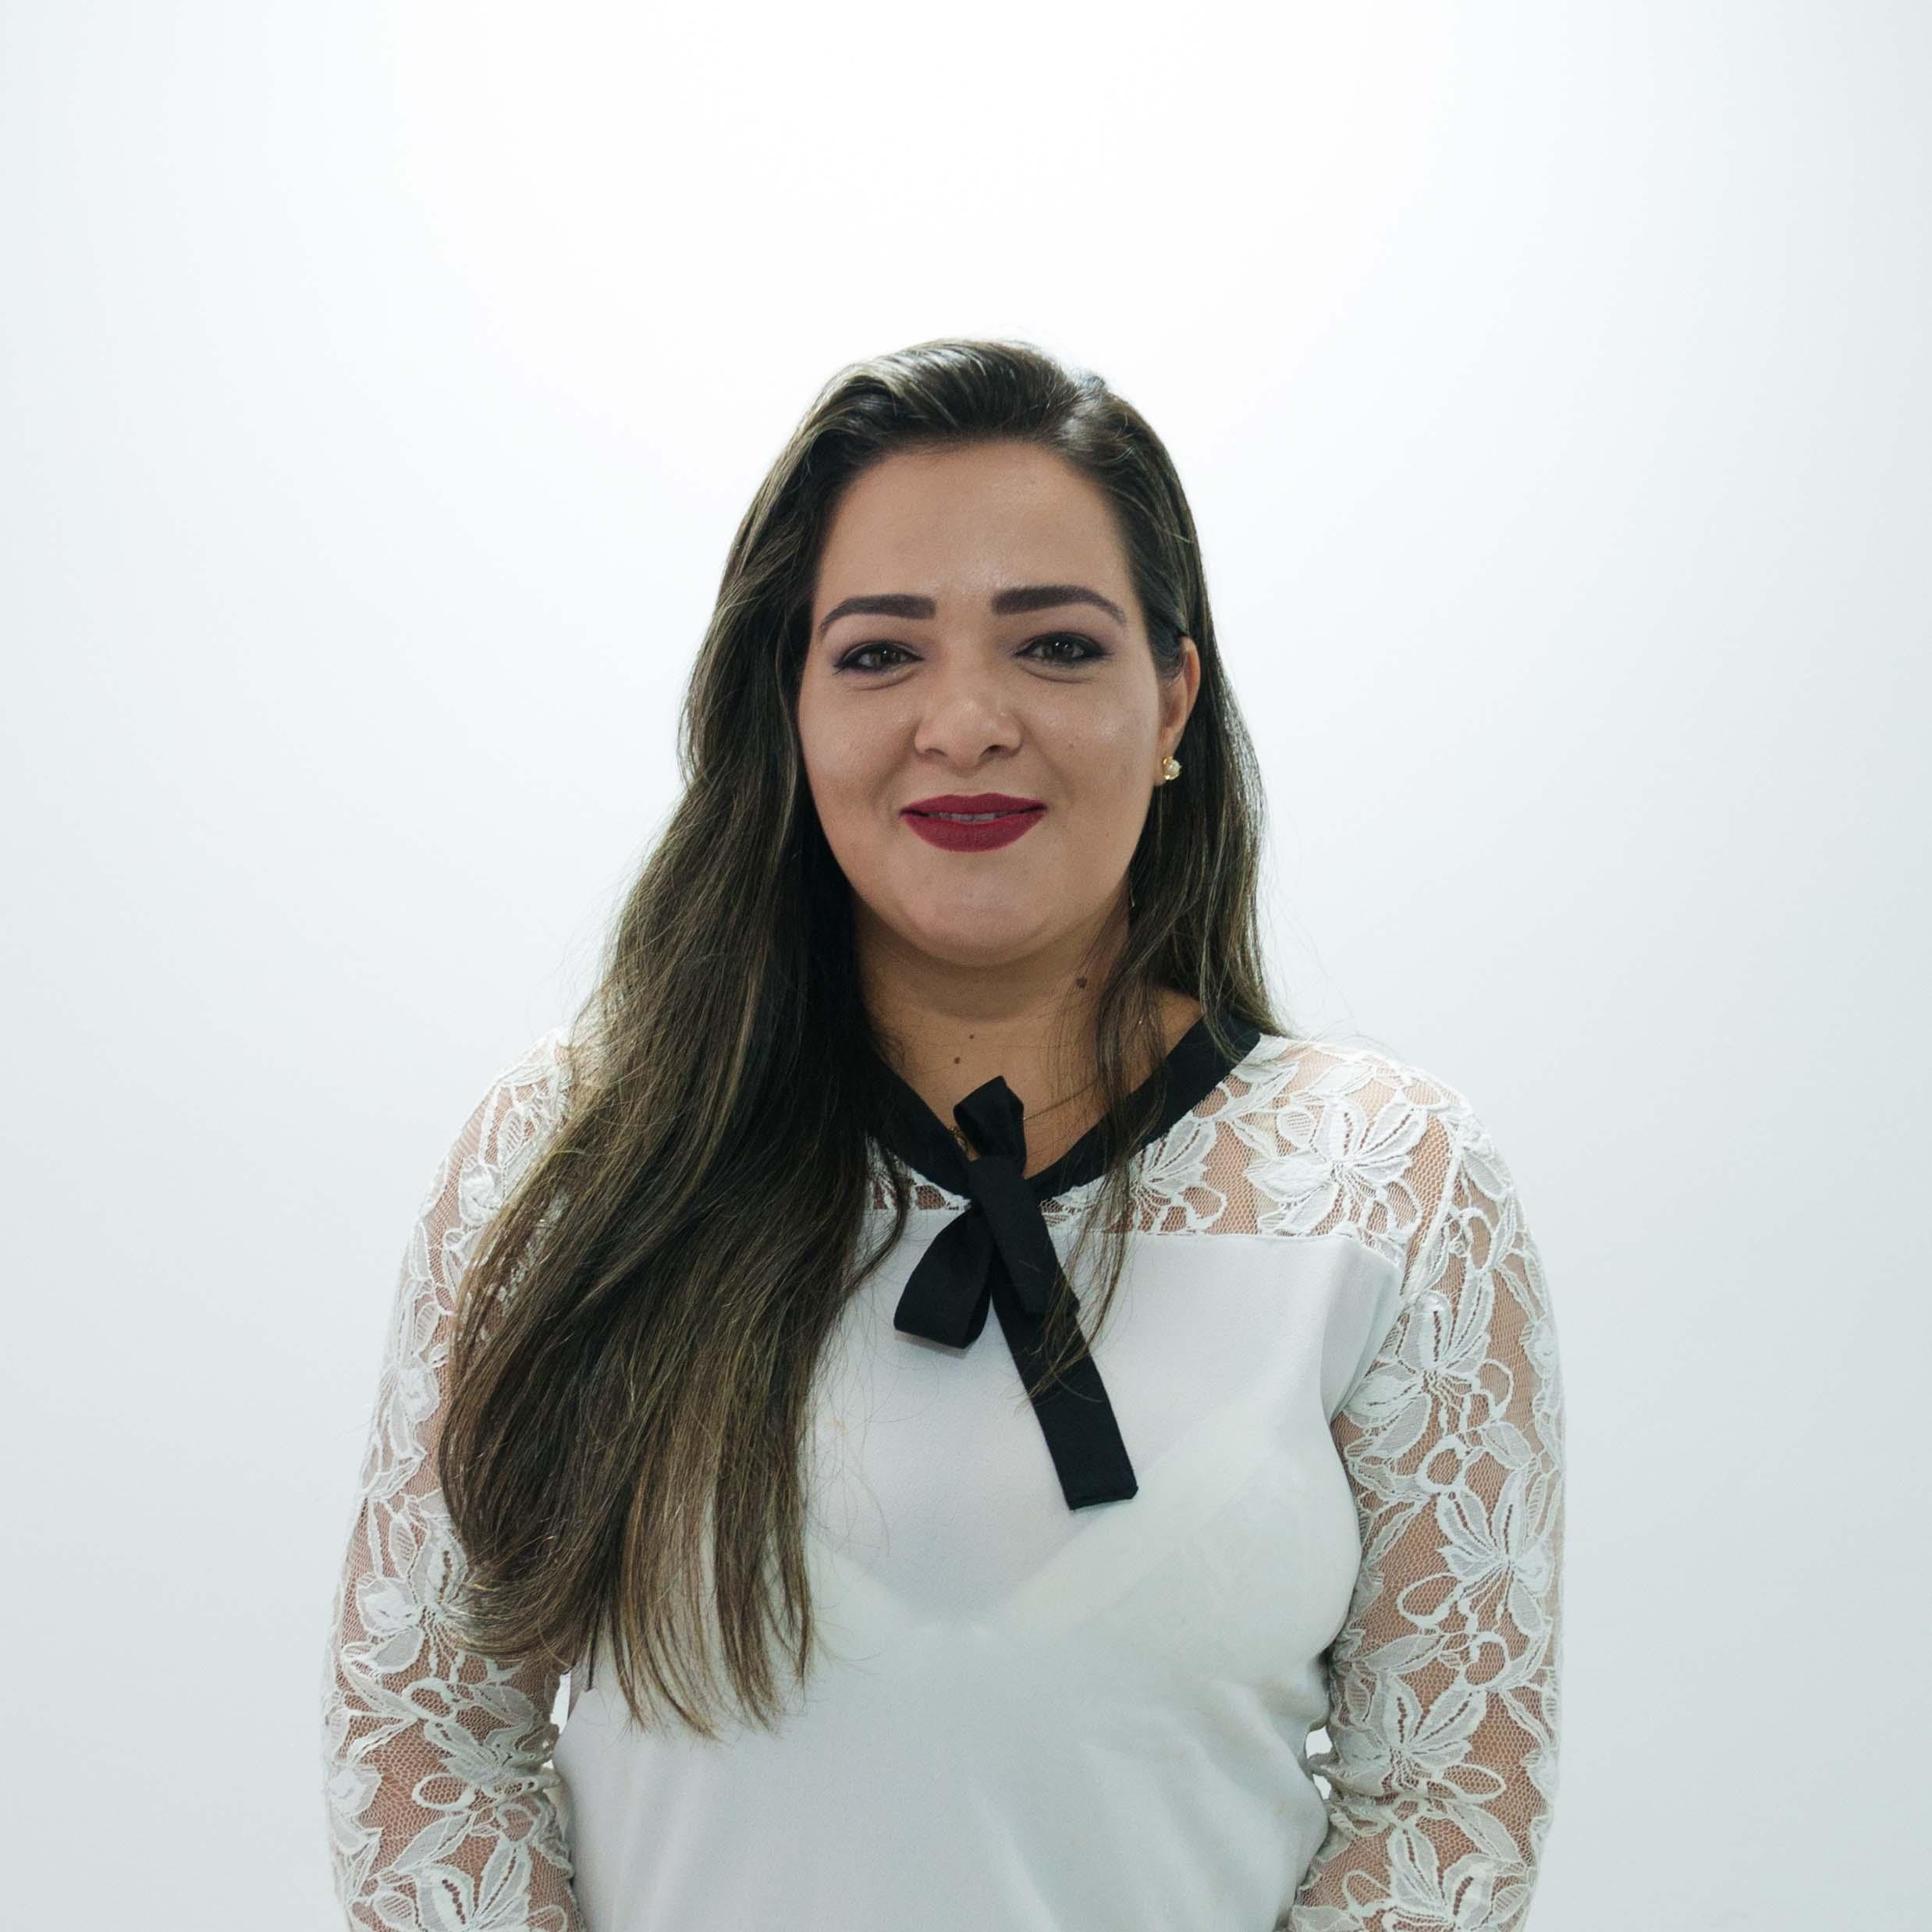 Lucycarla Oliveira